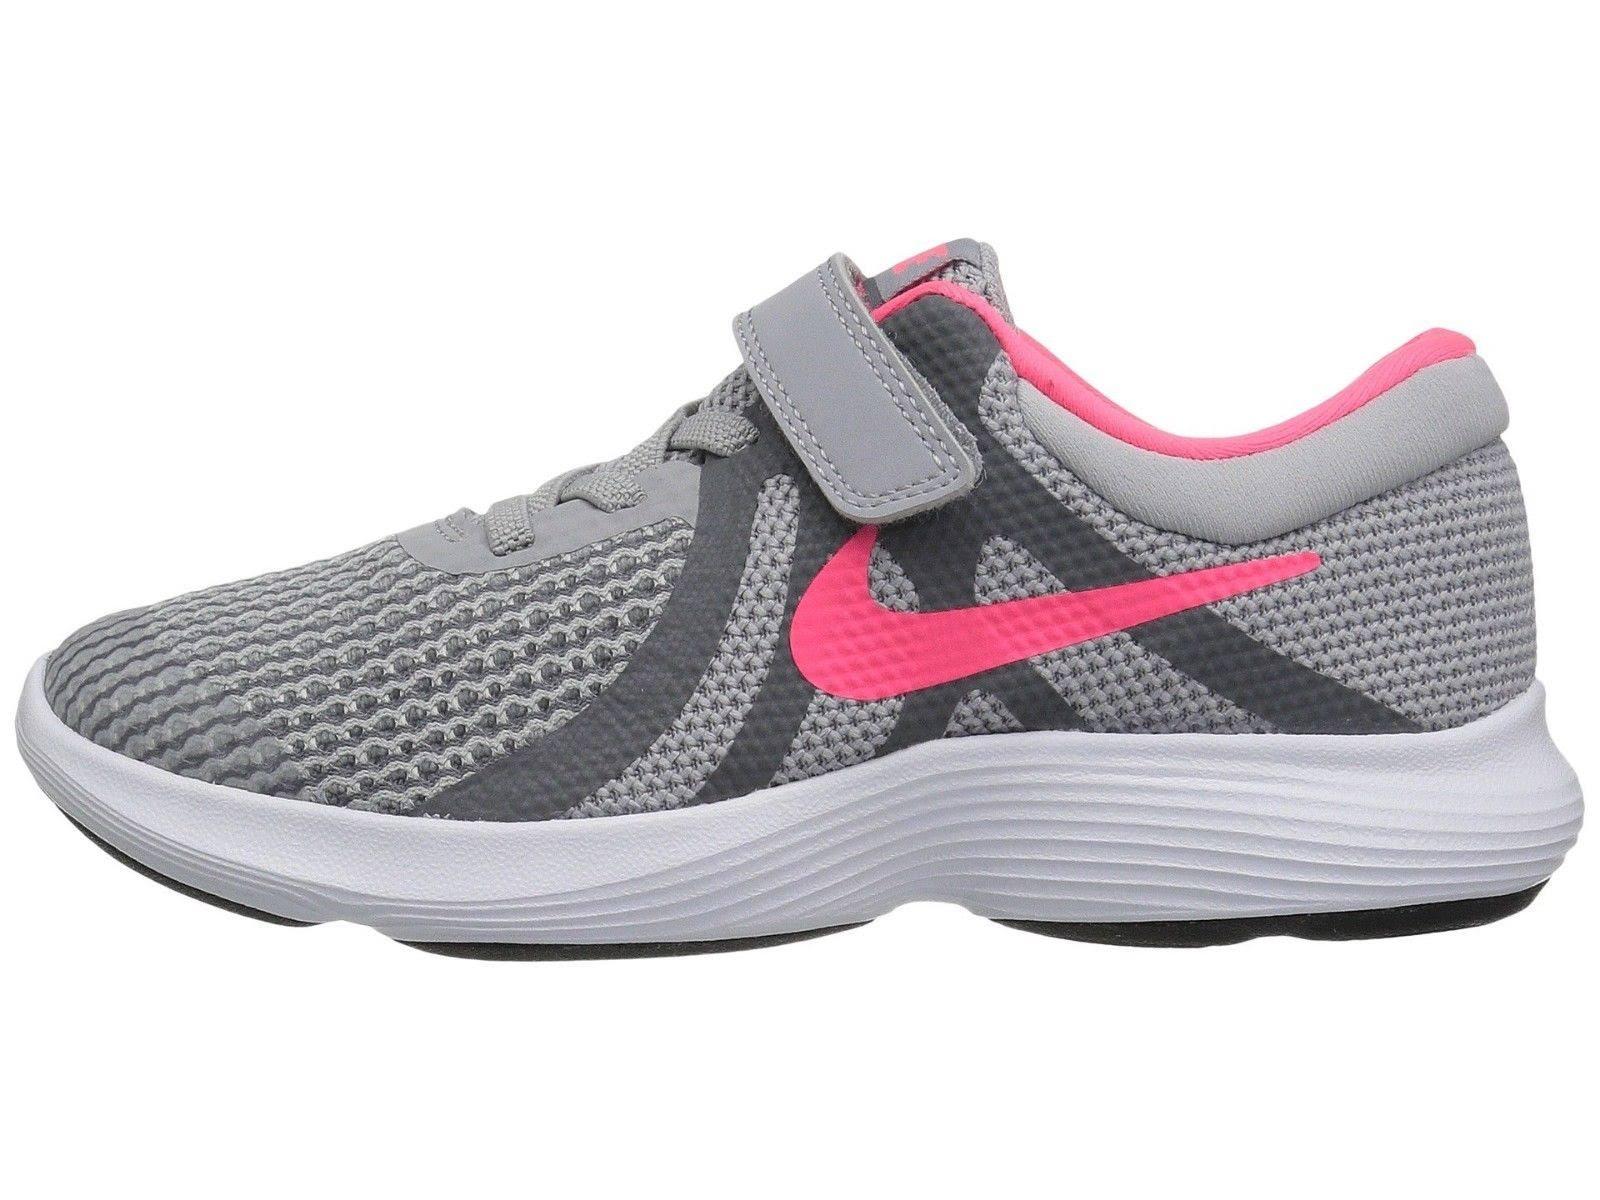 Wolf Revolution Nike pink Psv 003 4 943307 Grey wzqOTfXAqP